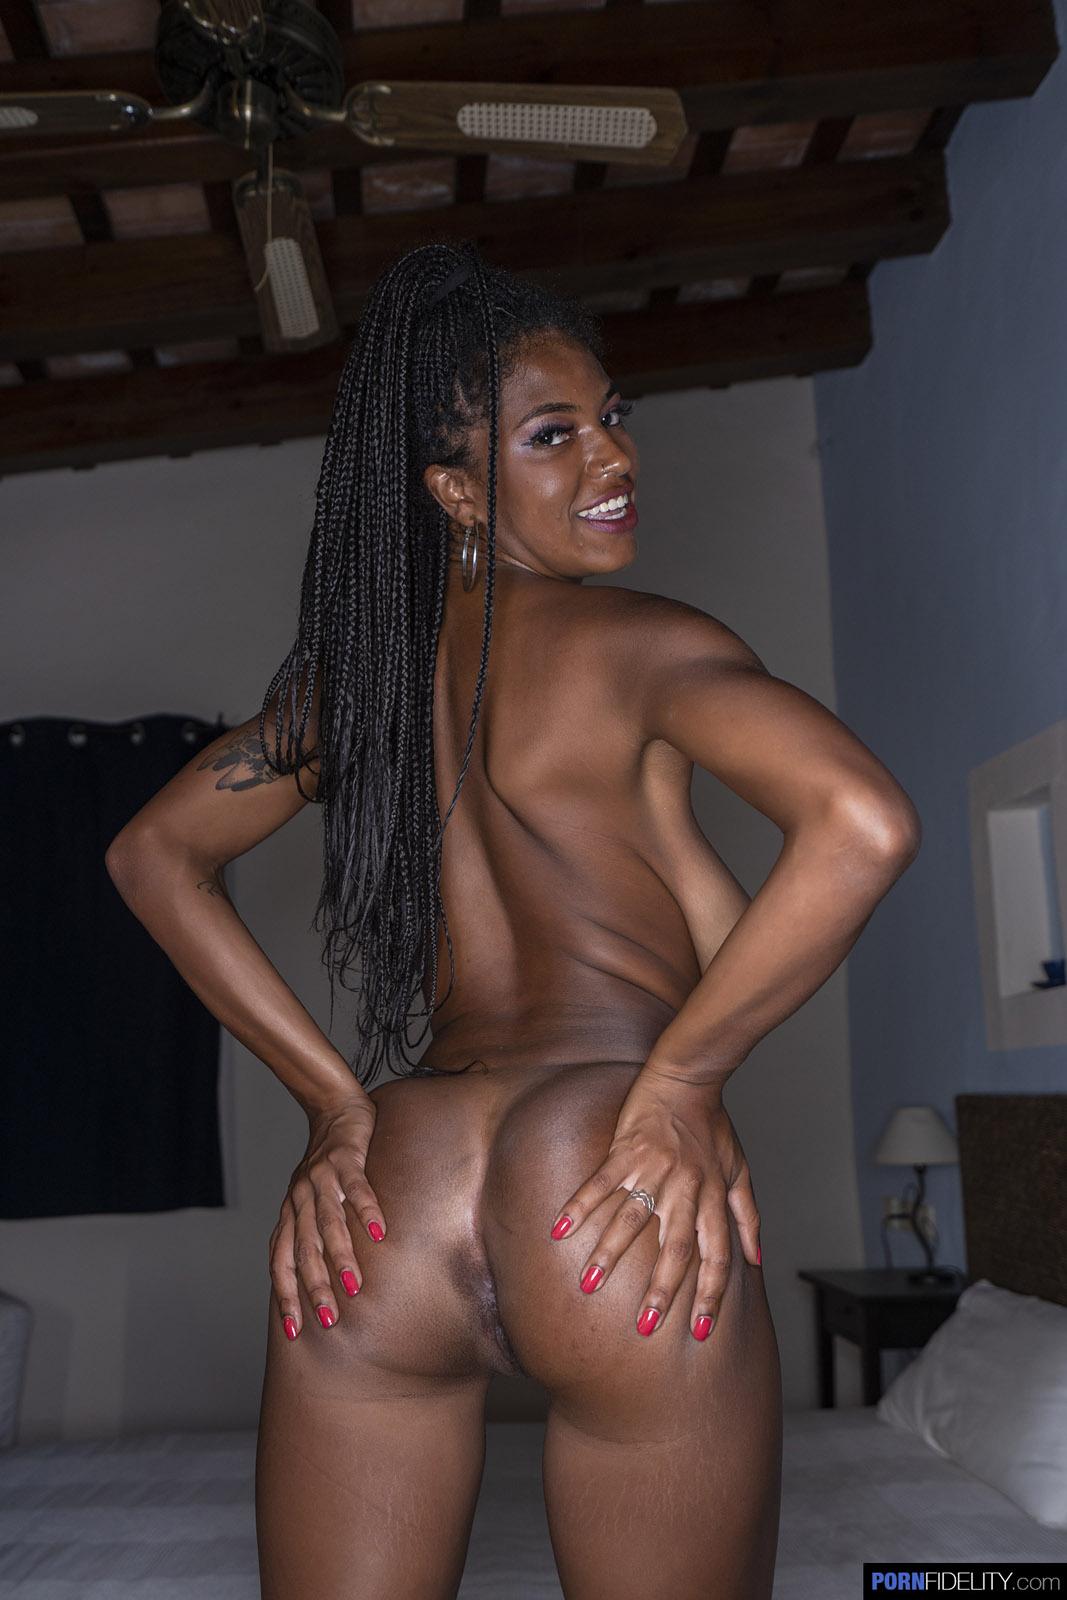 https://cdn.curvyerotic.com/wp-content/uploads/2020/09/tina-fire-shes-on-fire-pornfidelity-11.jpg